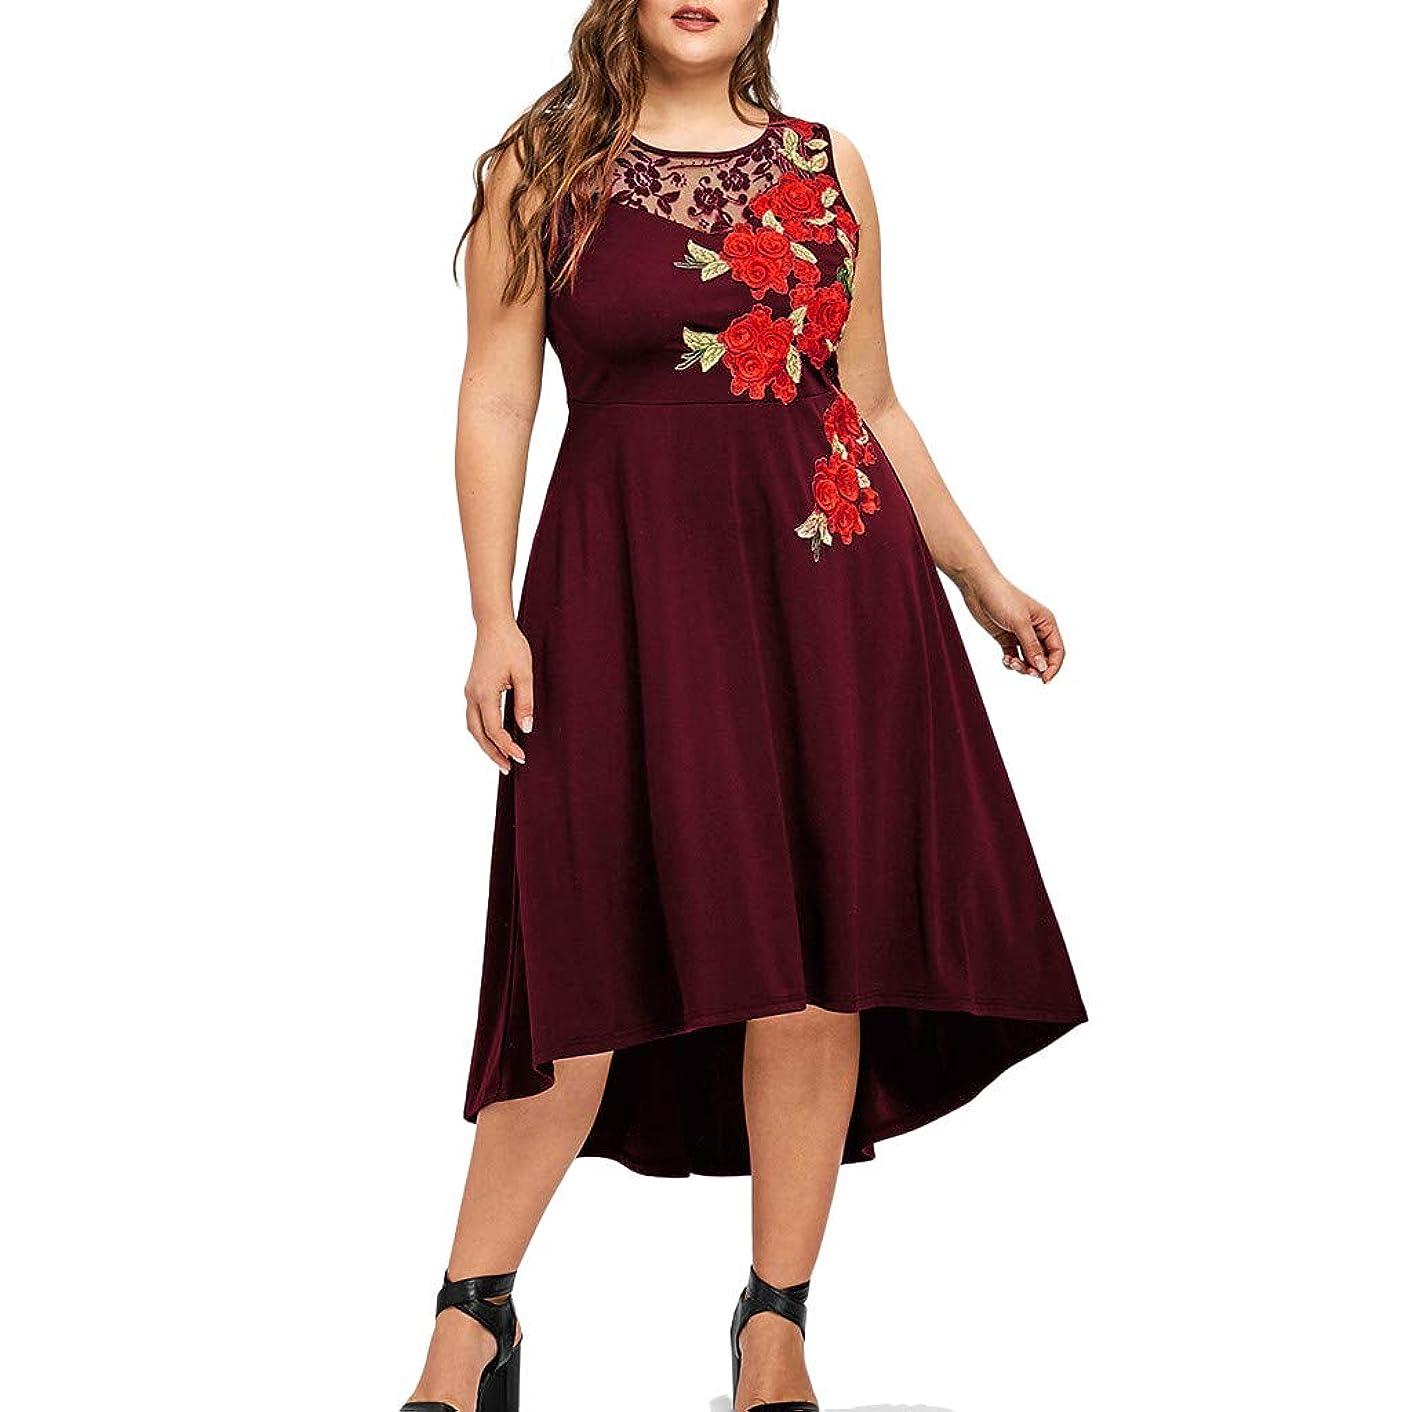 NREALY Vestido Womens Plus Size O-Neck Appliques Zipper Perspective Sleeveless Mesh Dress